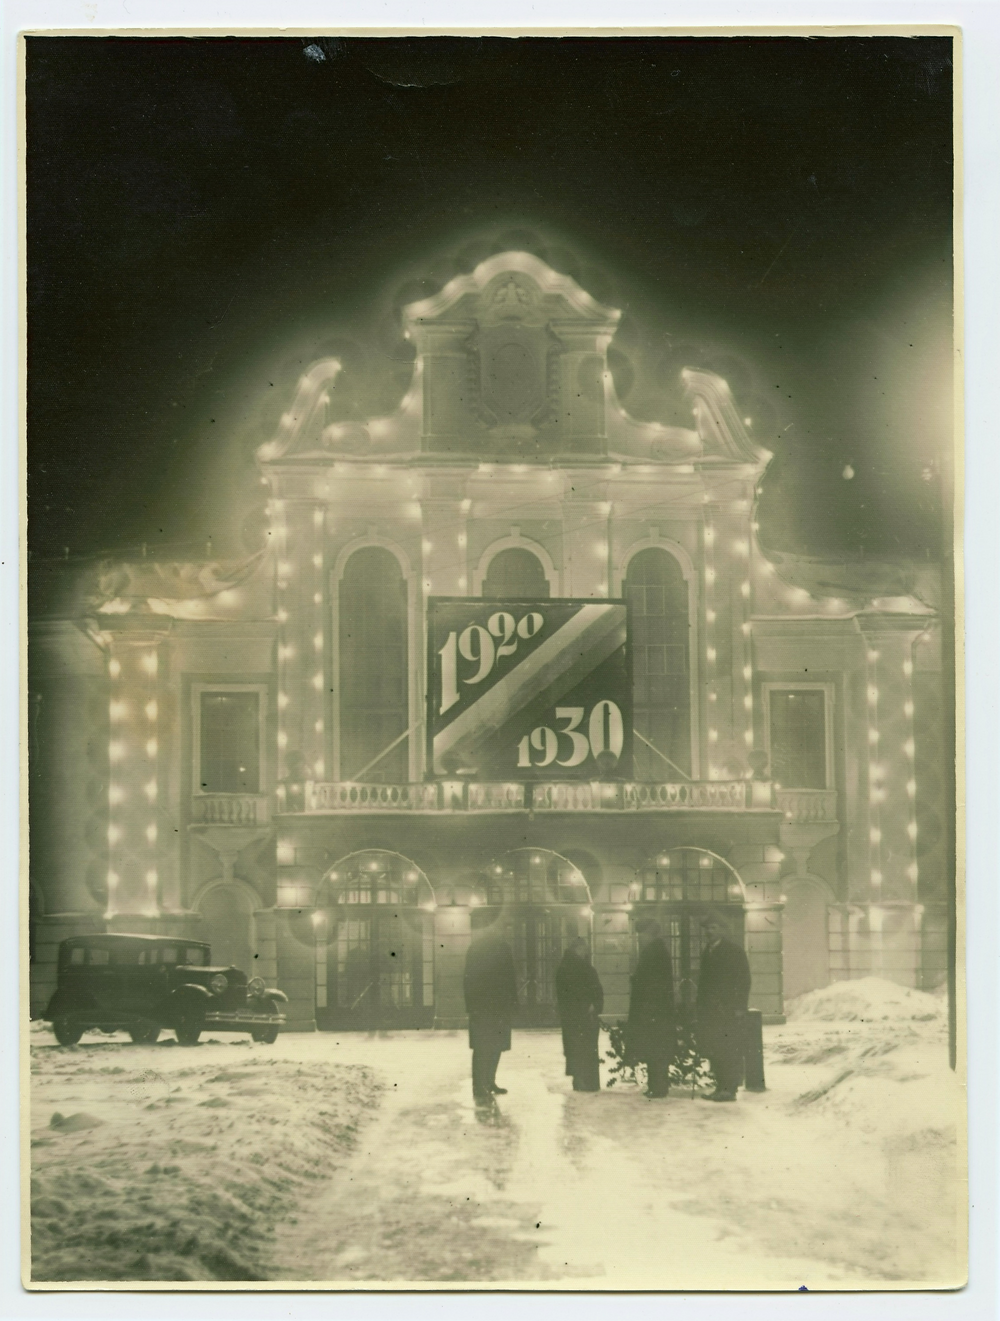 Valstybės teatras, 1930. LTMKM archyvo nuotrauka